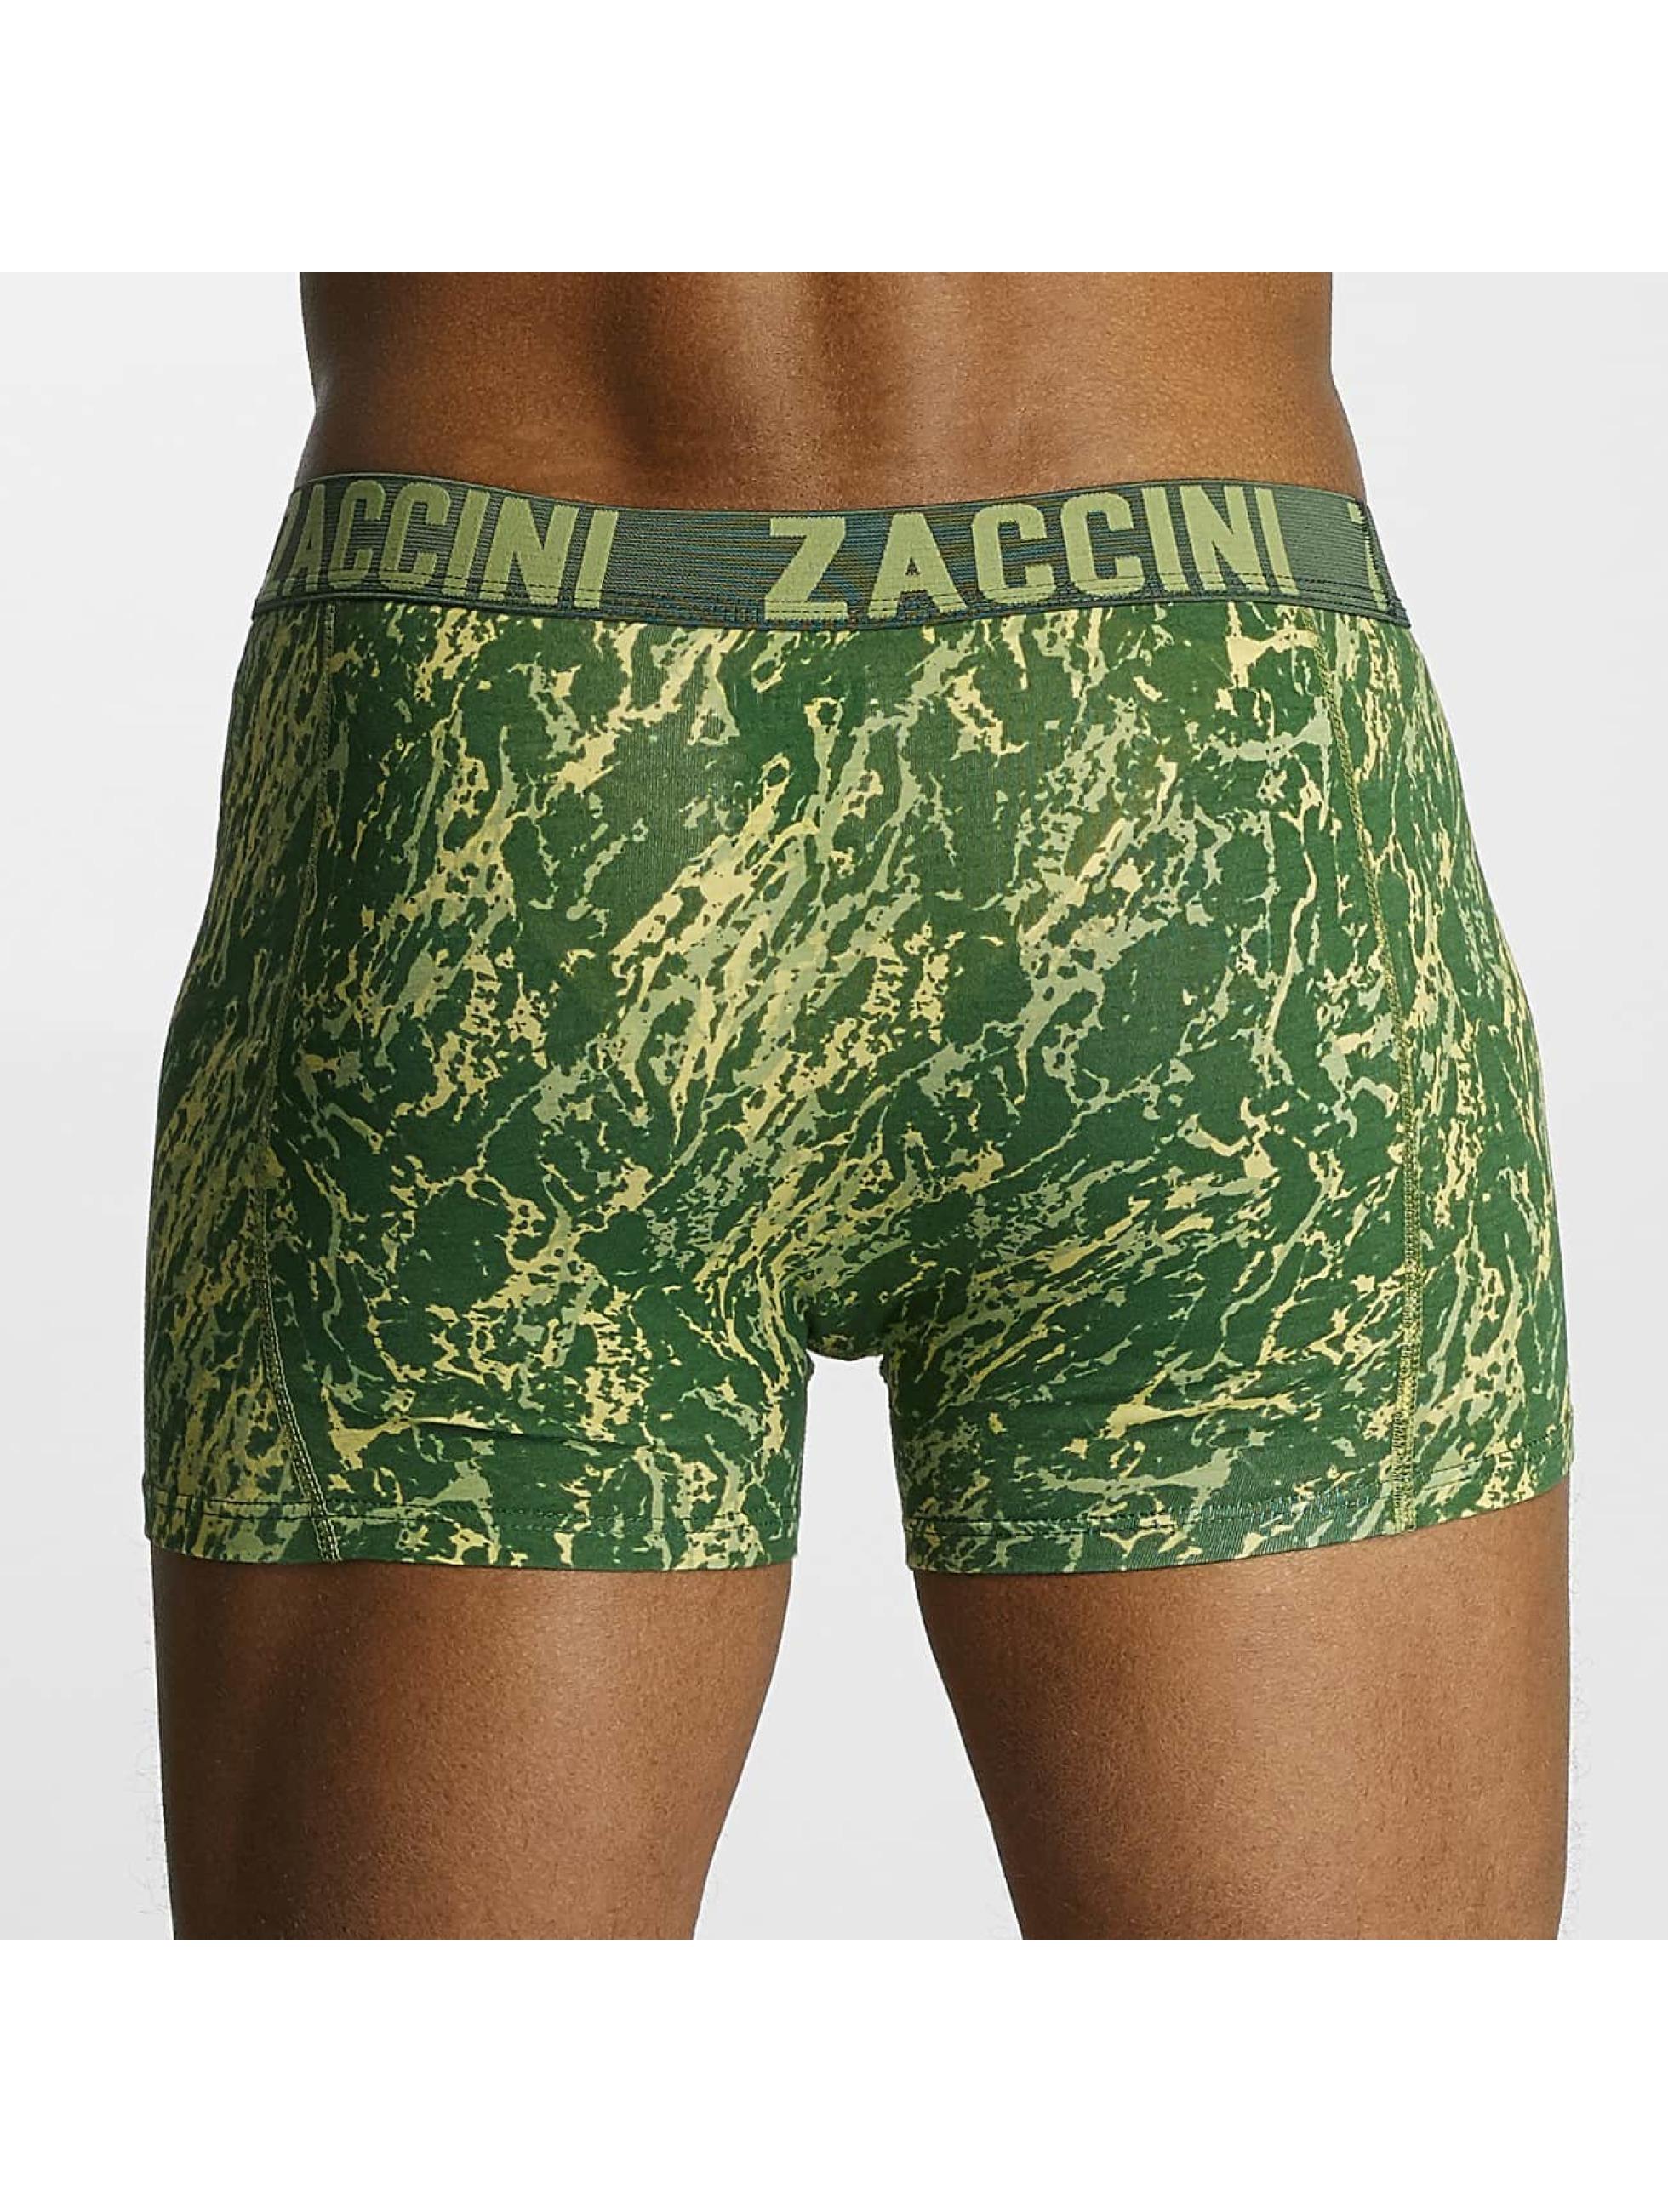 Zaccini Boxershorts Mineral grün